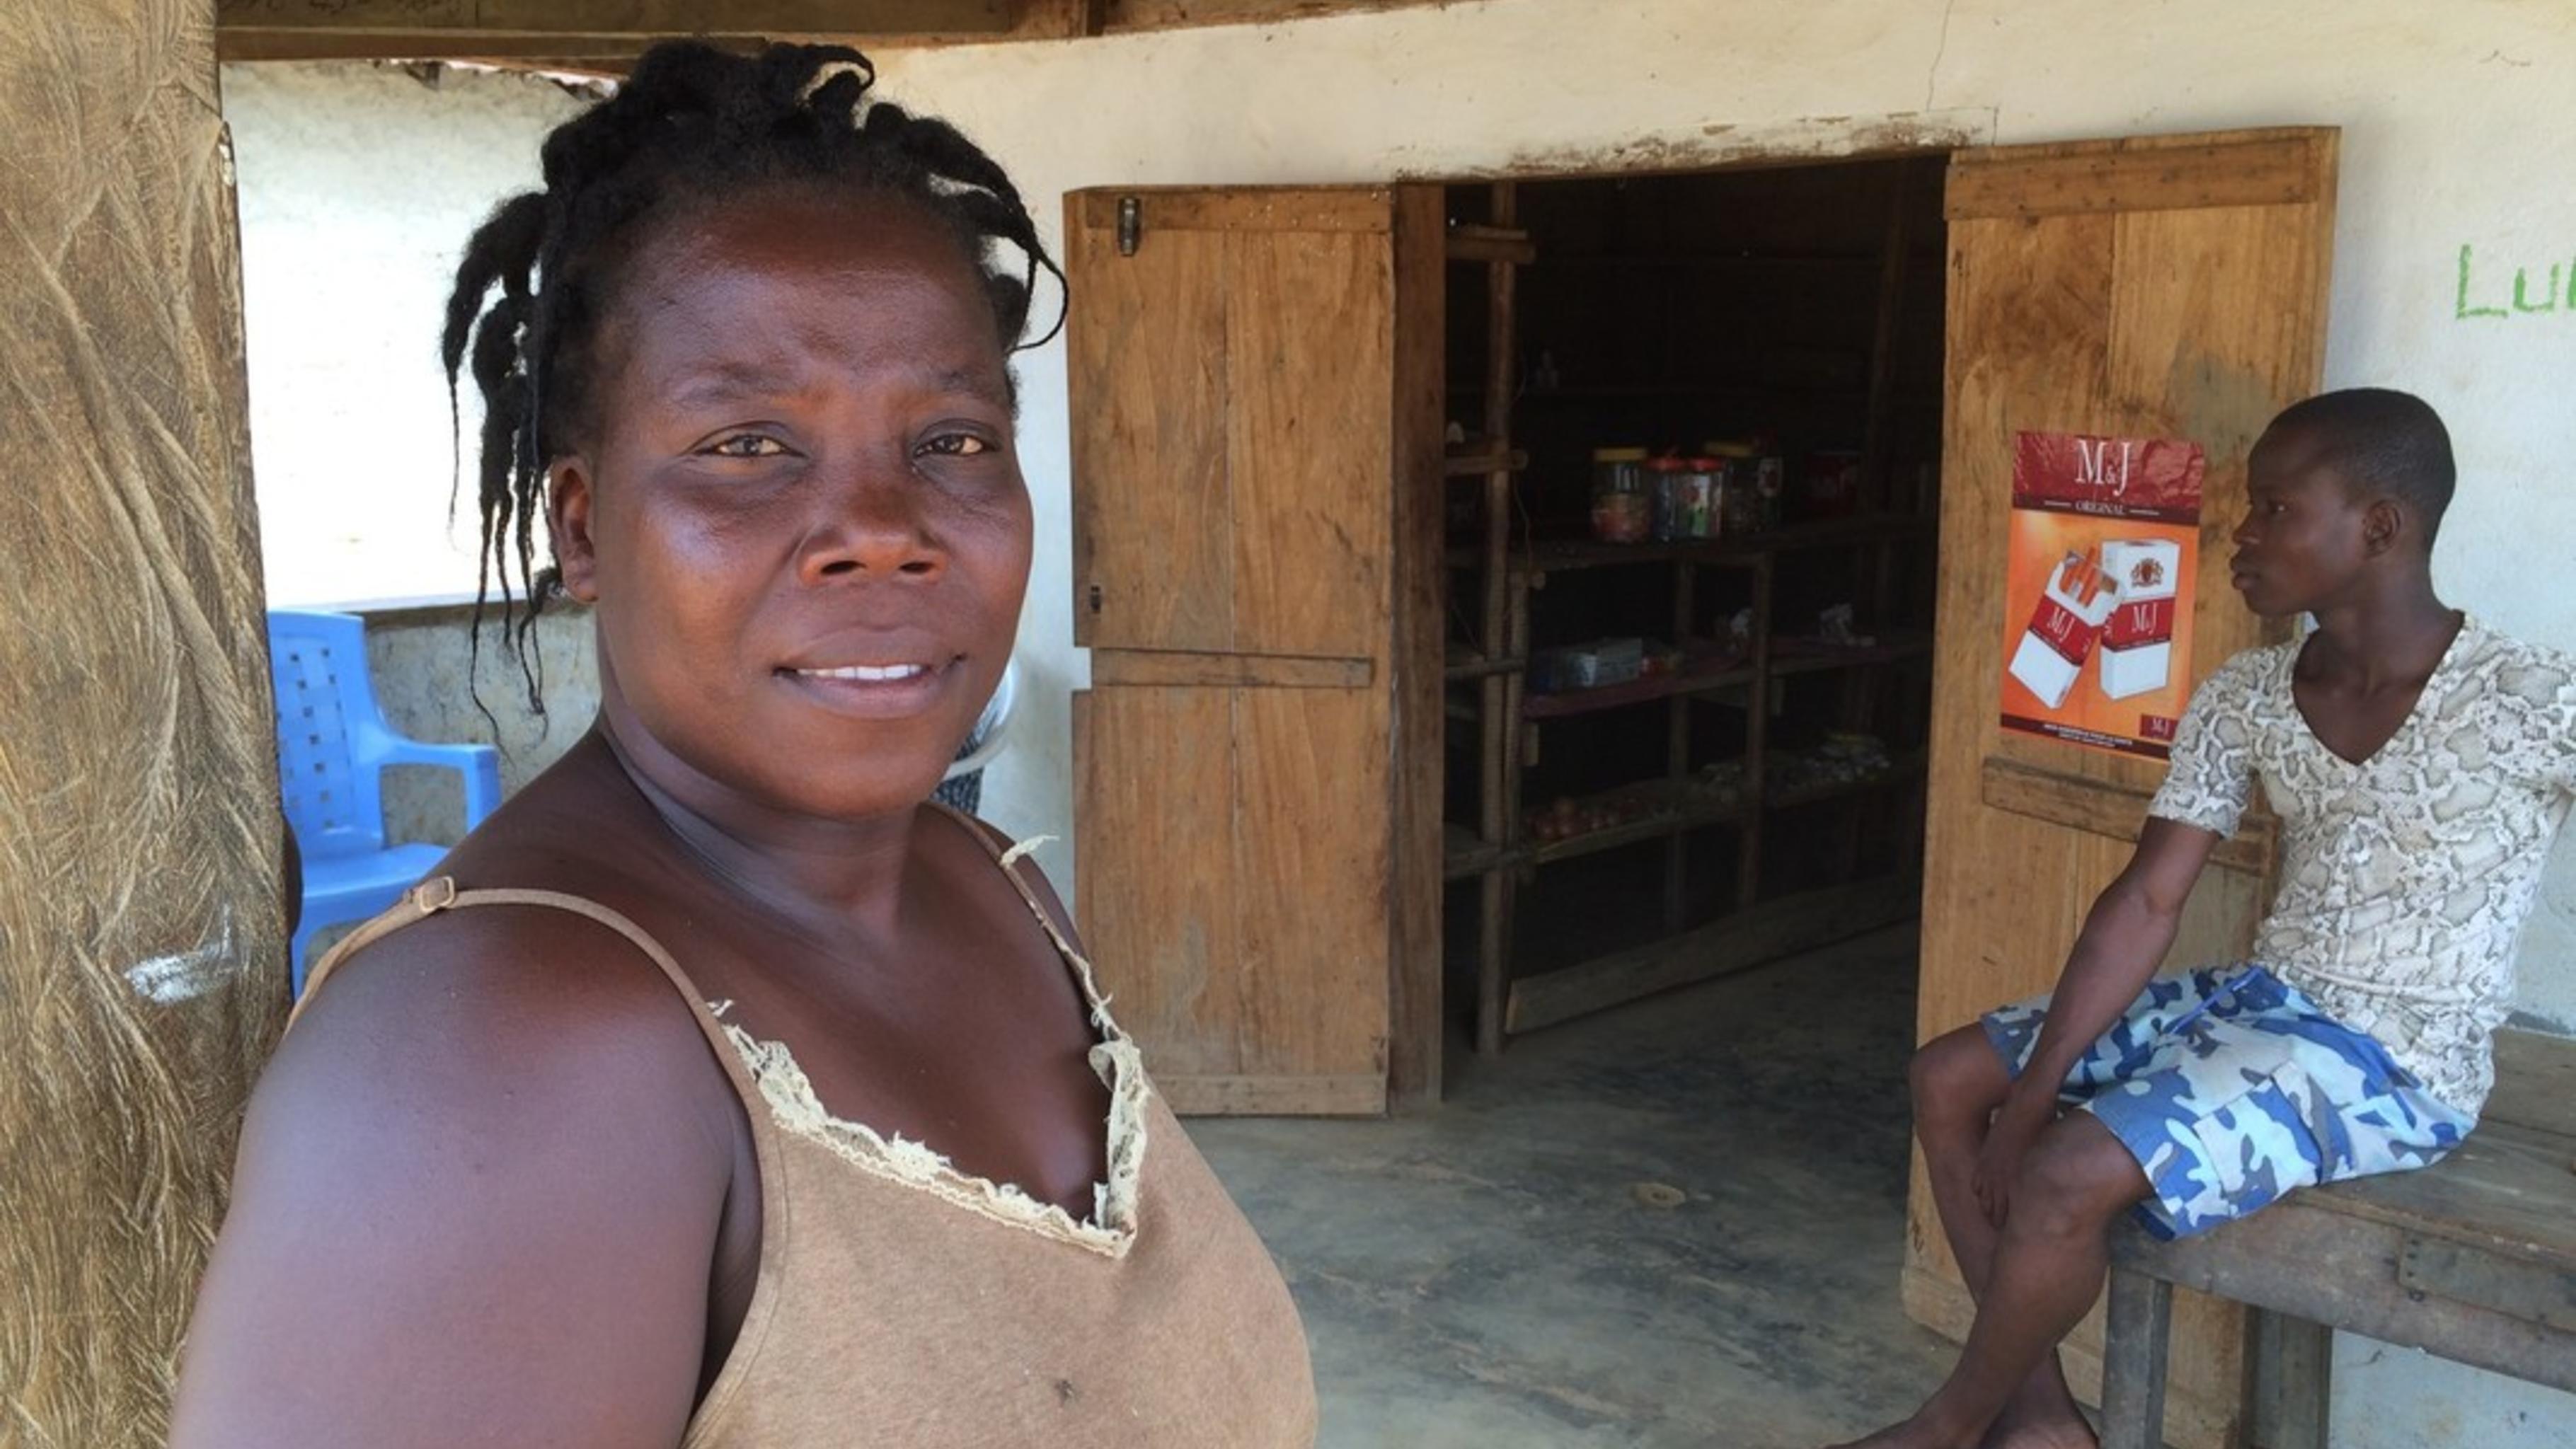 Jacqueline Koleh, Direktorin der Sehkpor Bartuah Grundschule in Liberia